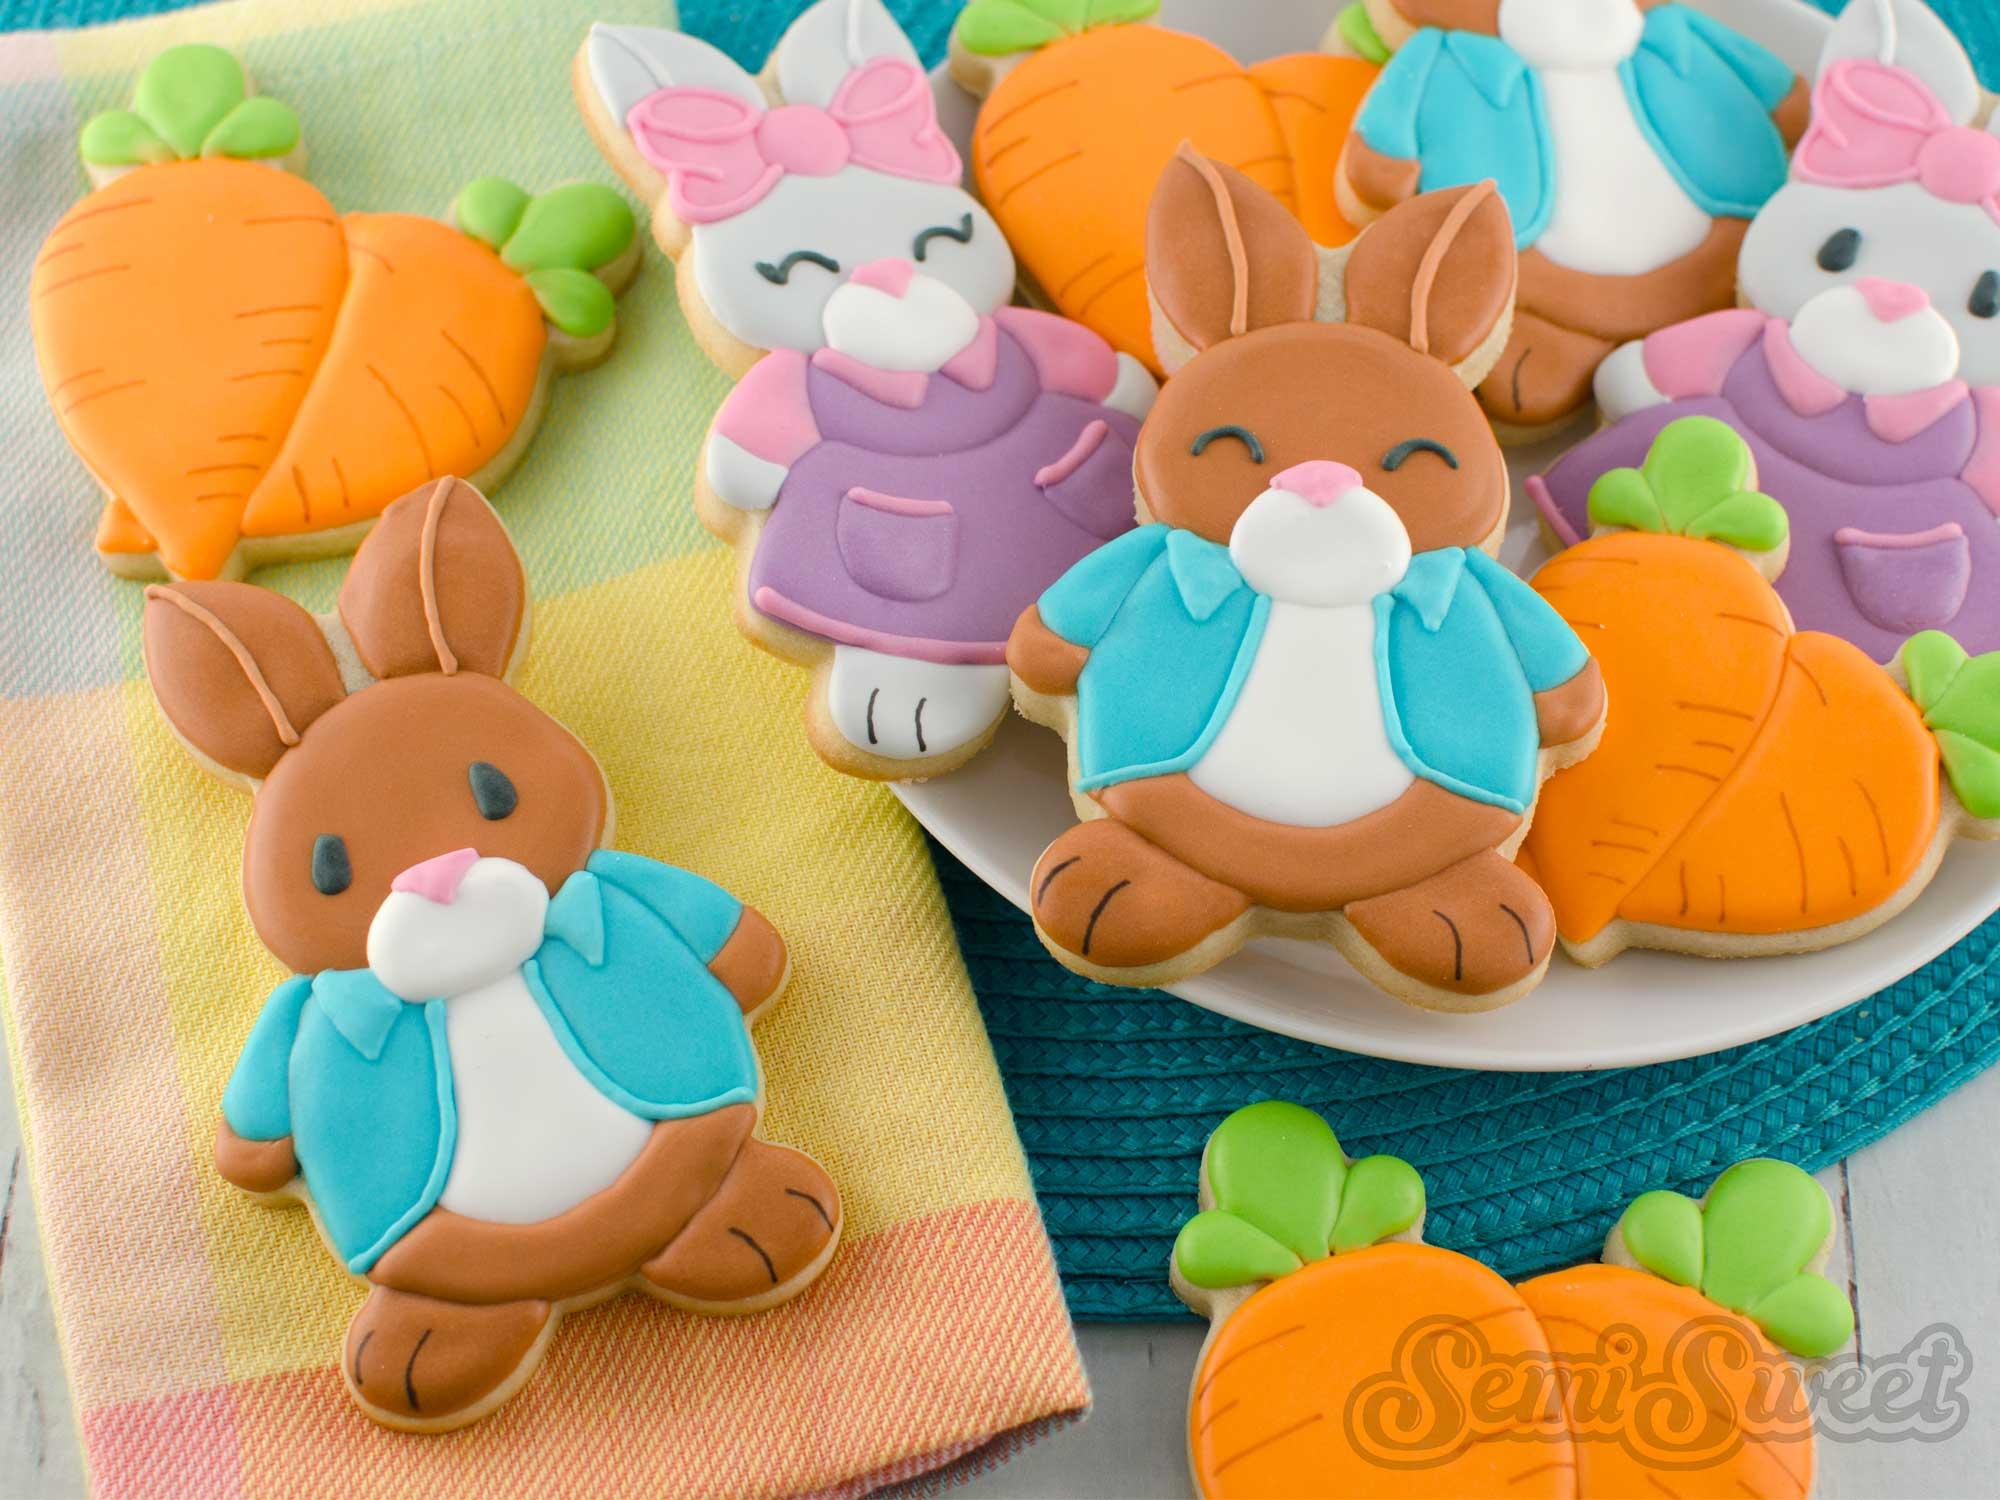 Peter Rabbit Inspired Cookies by SemiSweetDesigns.com